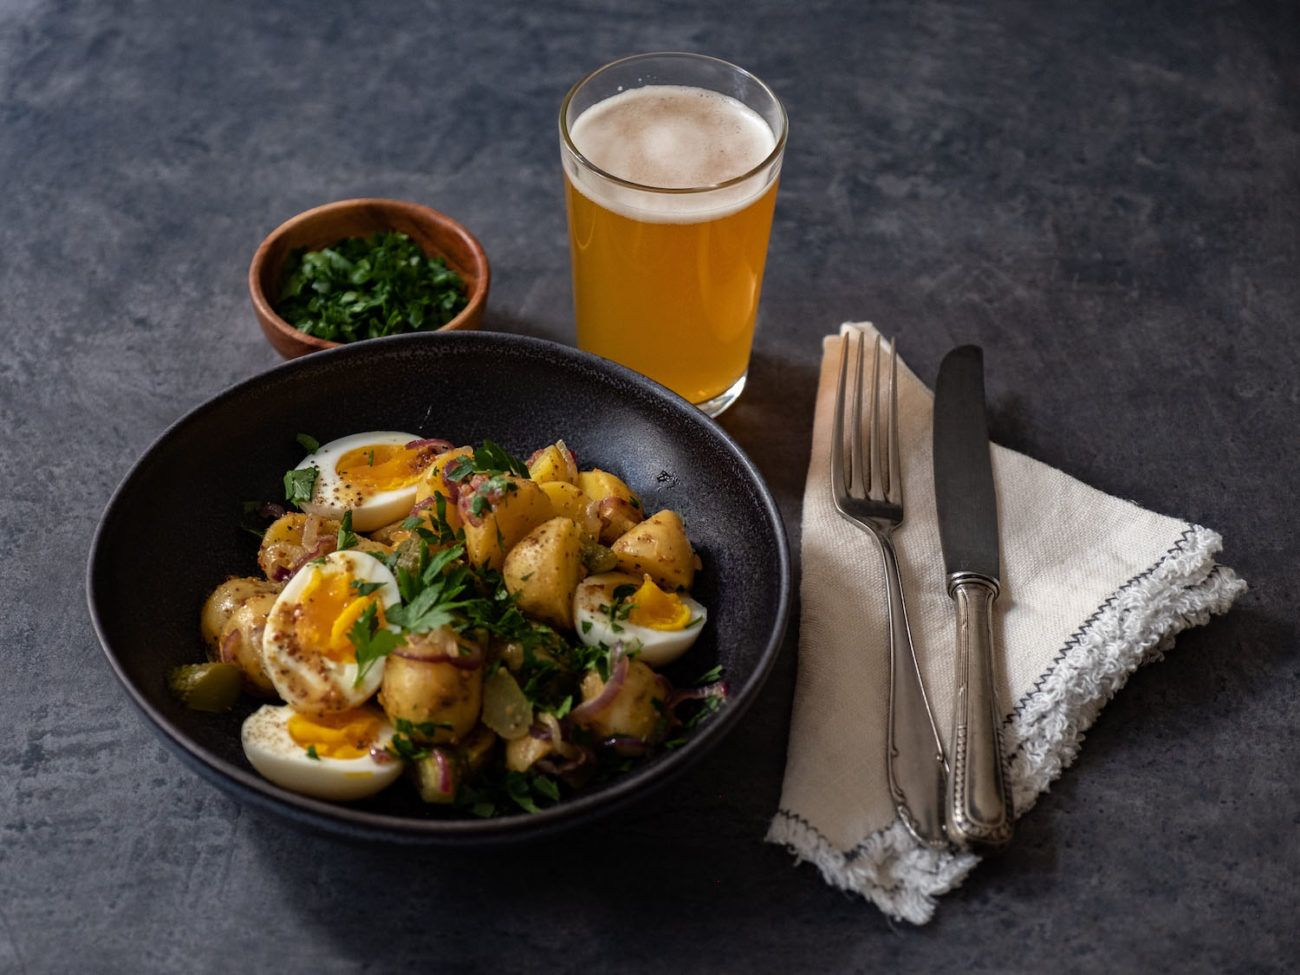 Rezept, Kartoffelsalat mit gekochten Eiern, Senfdressing, Essiggurken, Petersilie, Serviette, Bier, Besteck